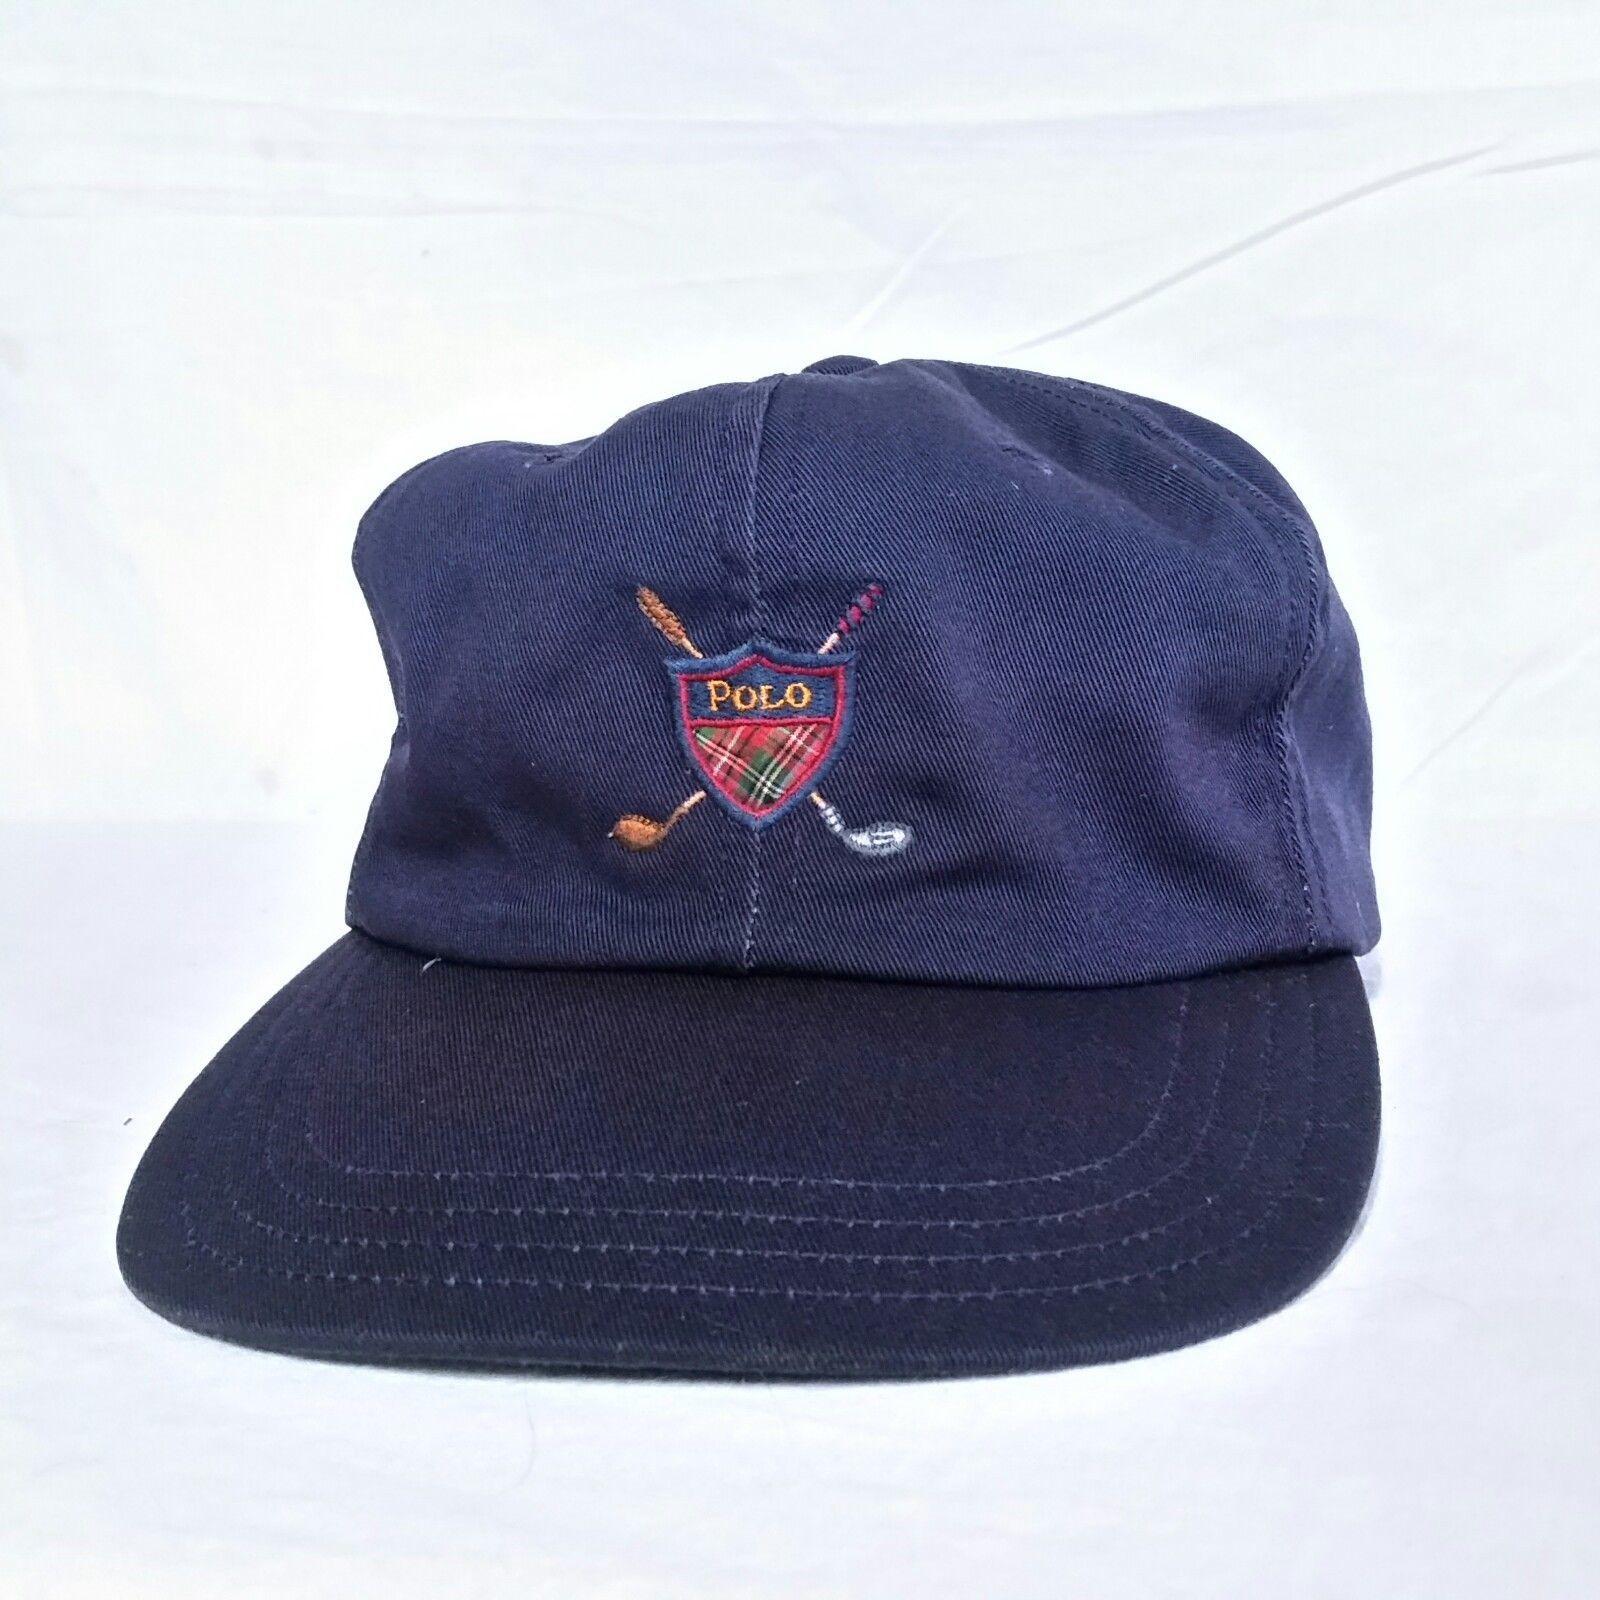 VTG Polo Ralph Lauren Strapback Hat 90s Golf and 36 similar items. S l1600 f523049119e8